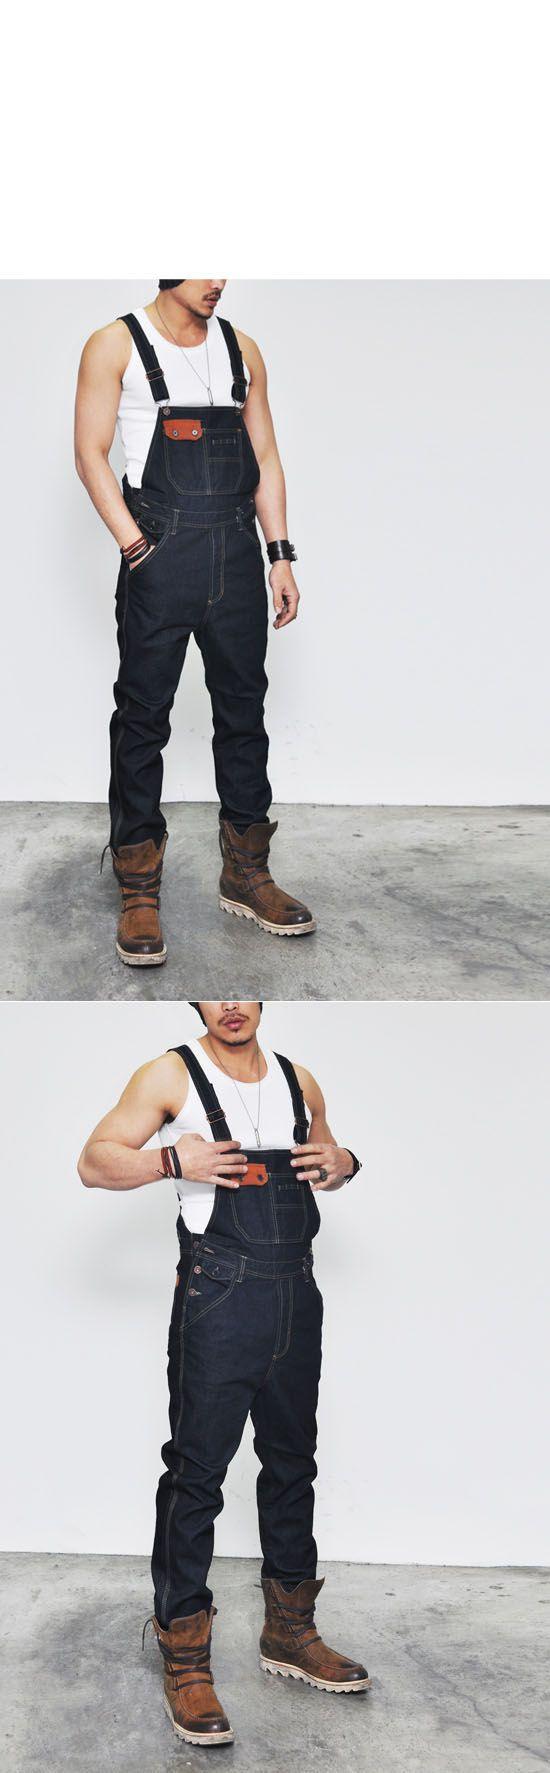 Bottoms :: Indigo Rigid Suspender Denim Overall-Jeans 119 ...